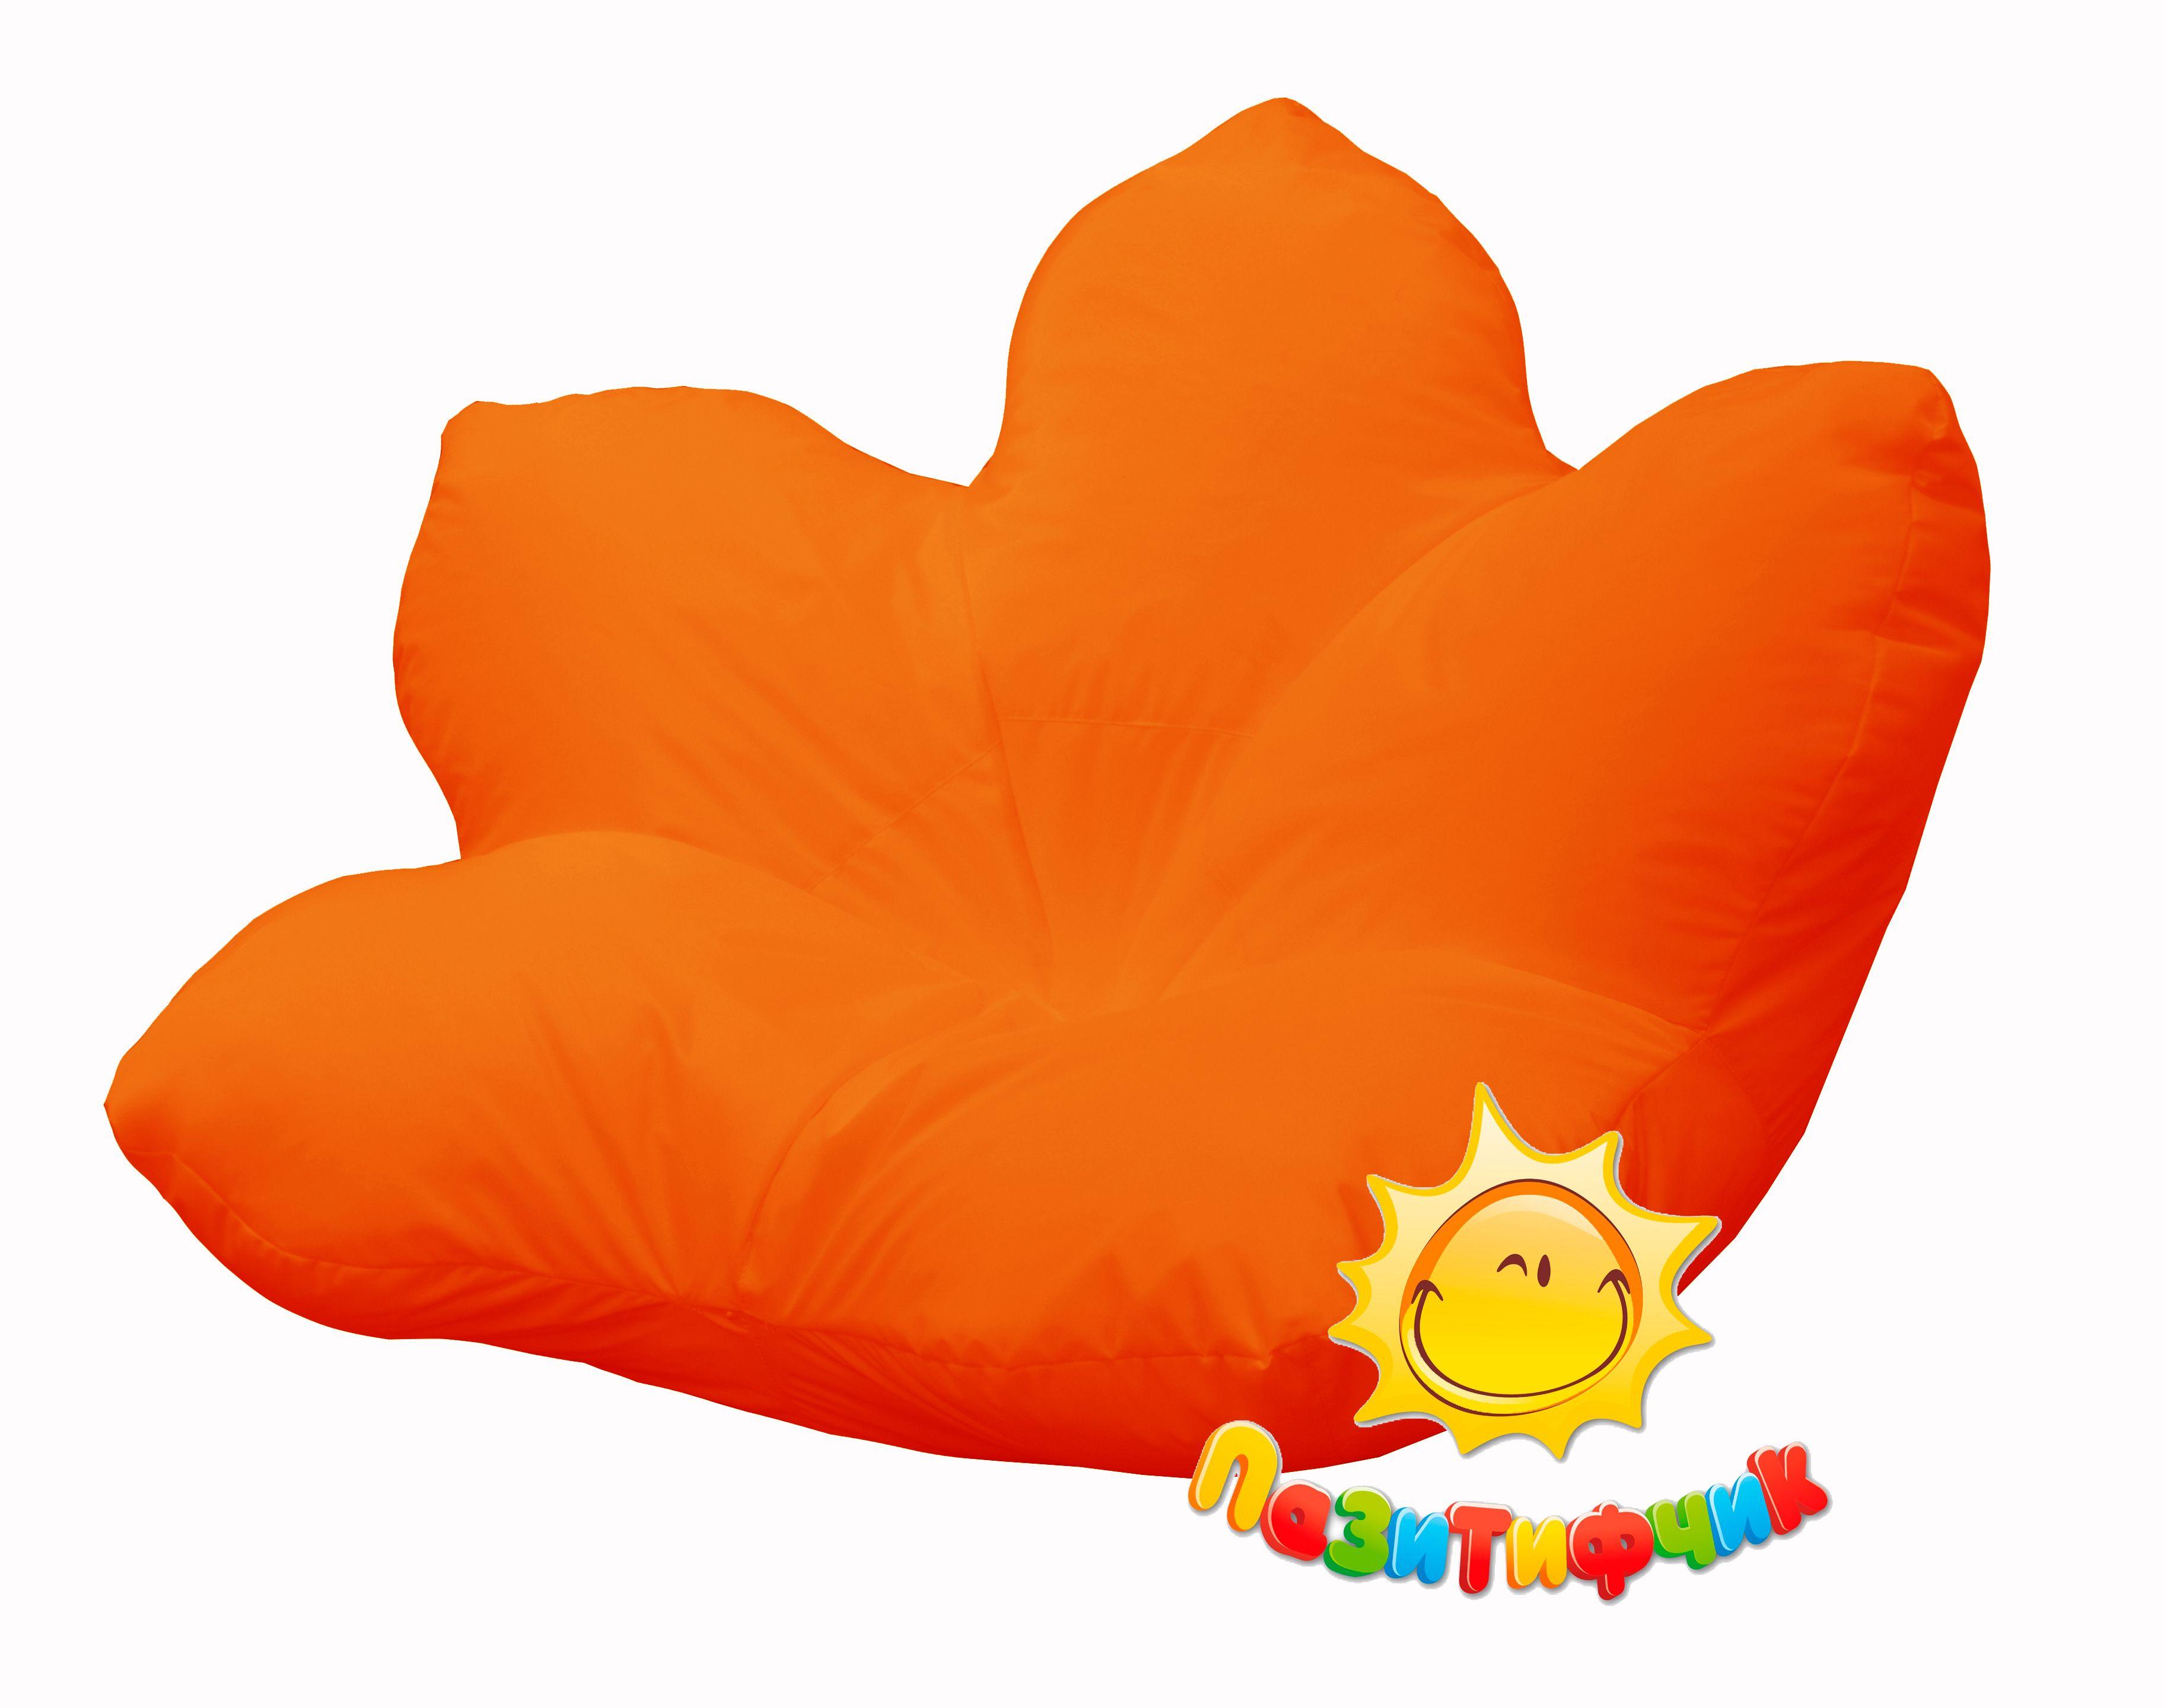 Кресло-мешок Pazitif Цветок Пазитифчик, размер XXXL, оксфорд, оранжевый фото